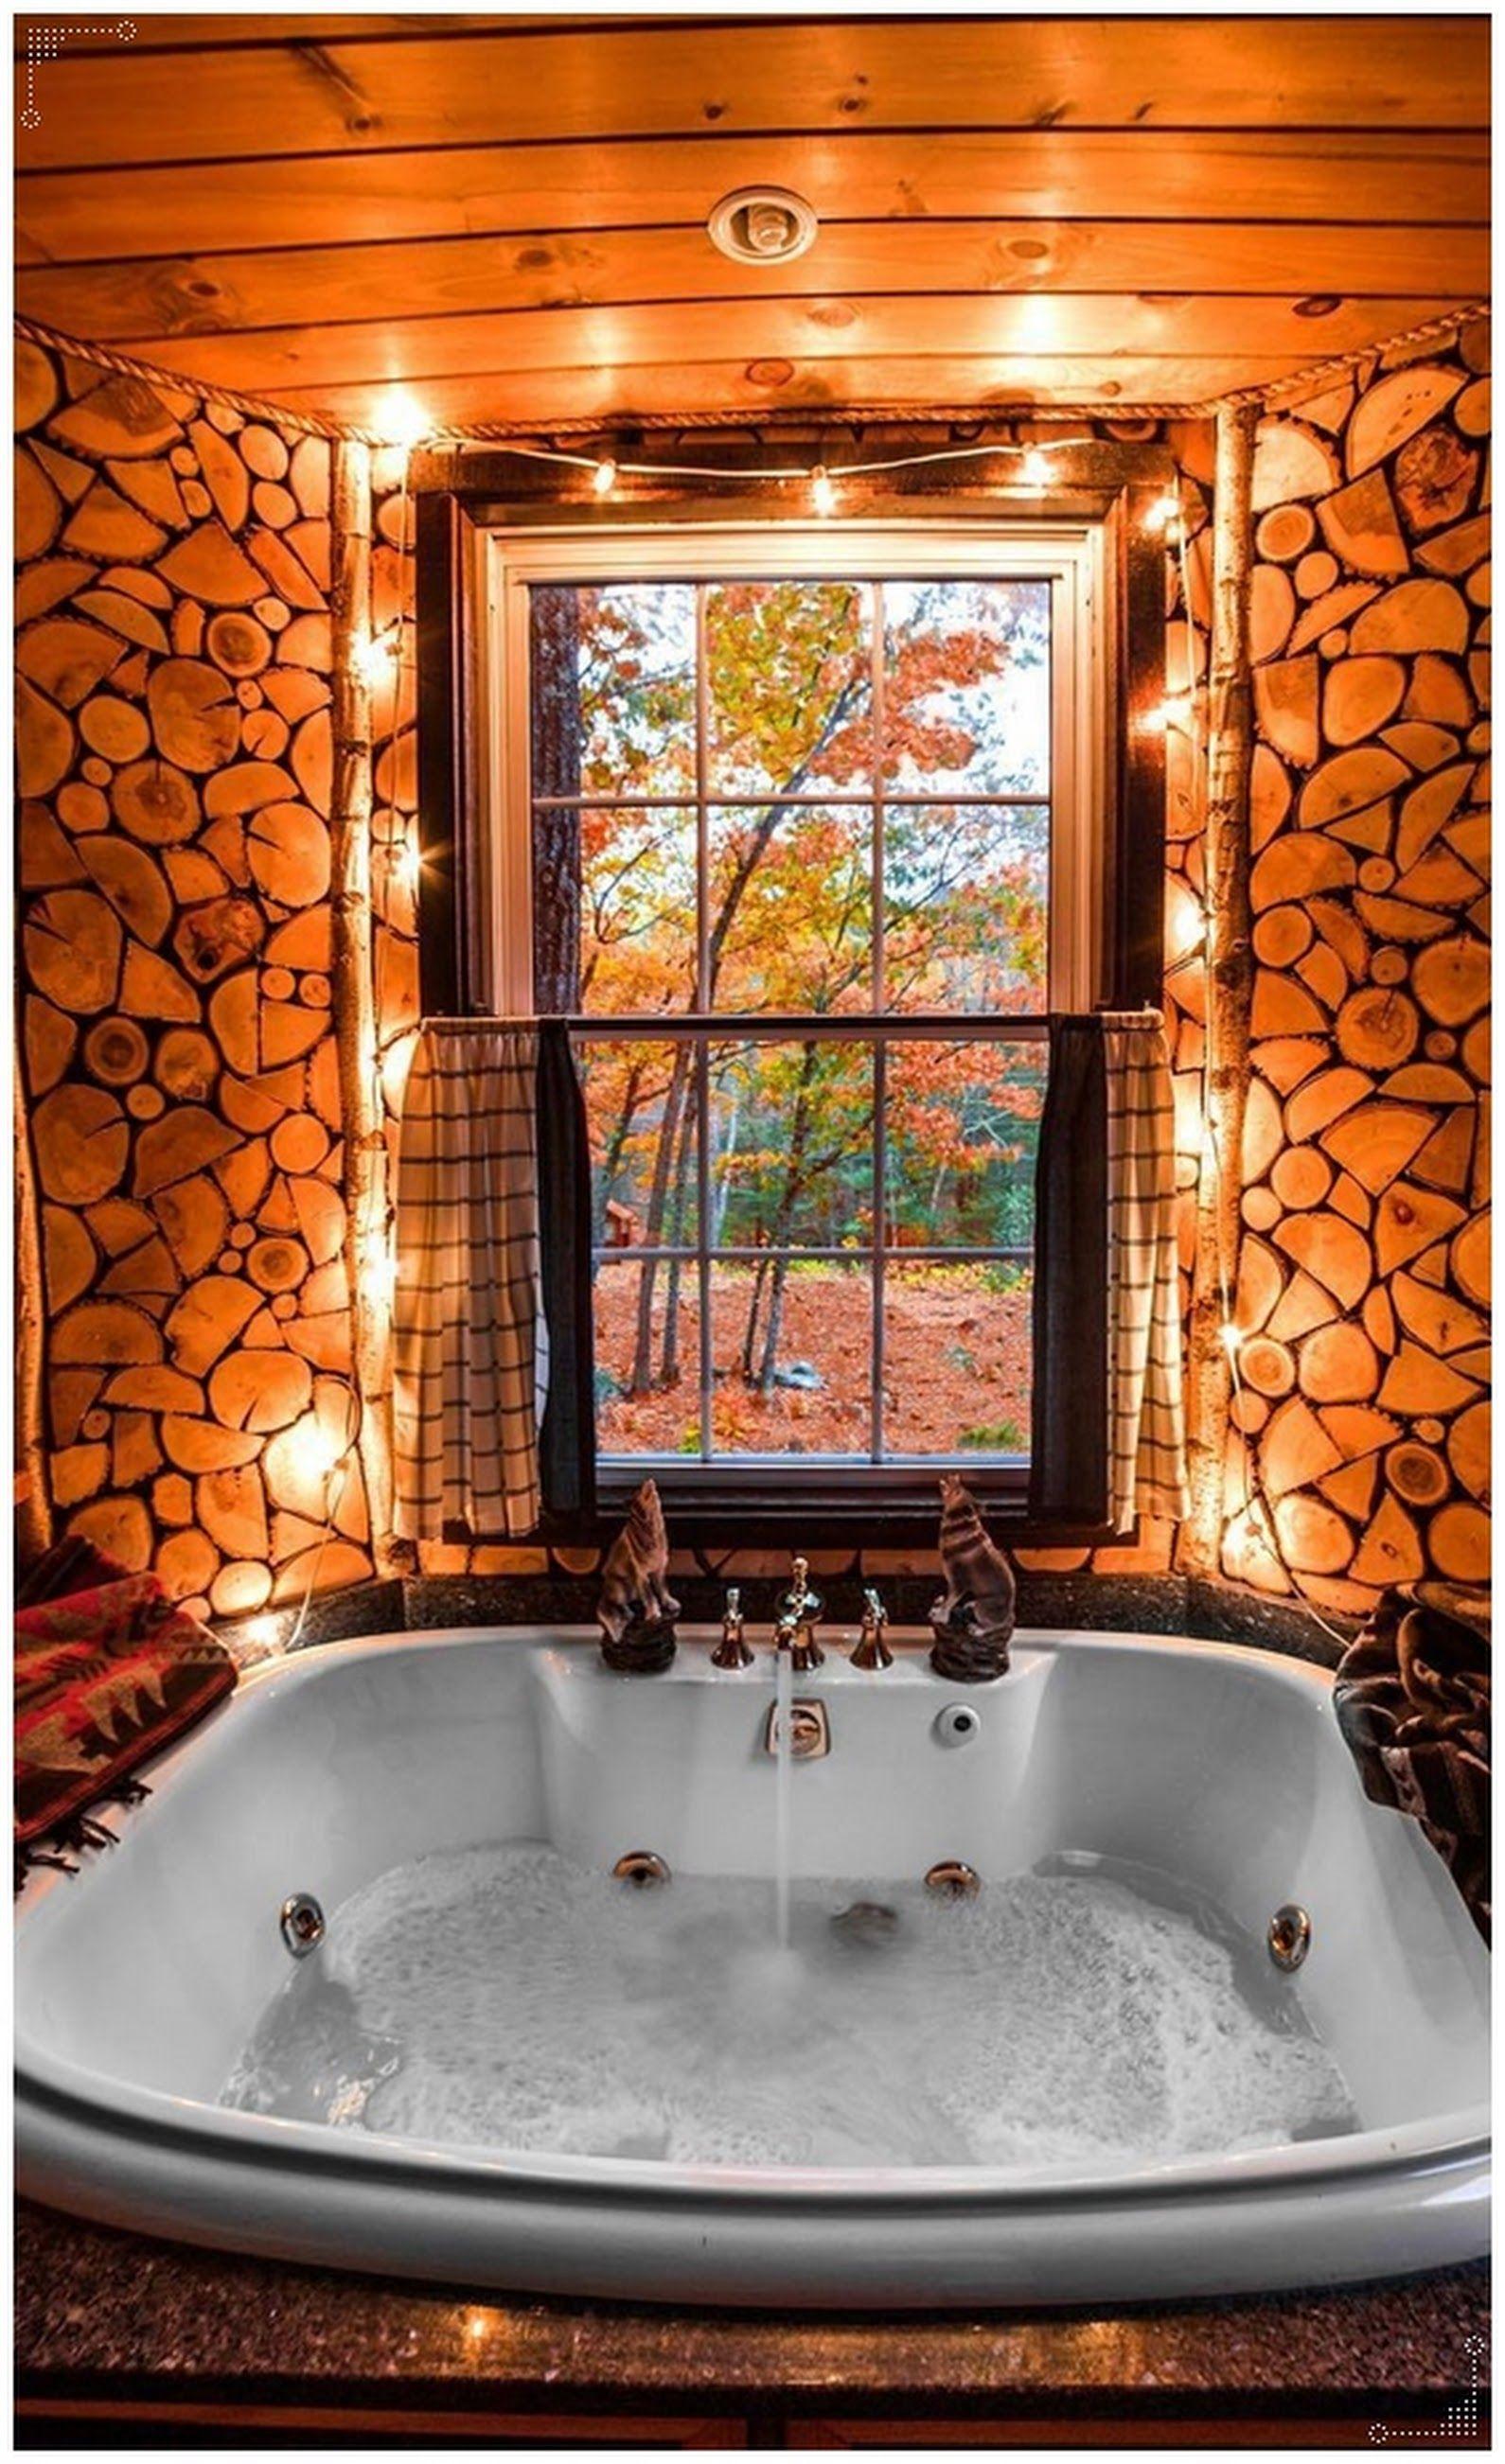 Beautiful Bathtub. - RAJESH PANDEY - Google+ | Hindi quotes ...